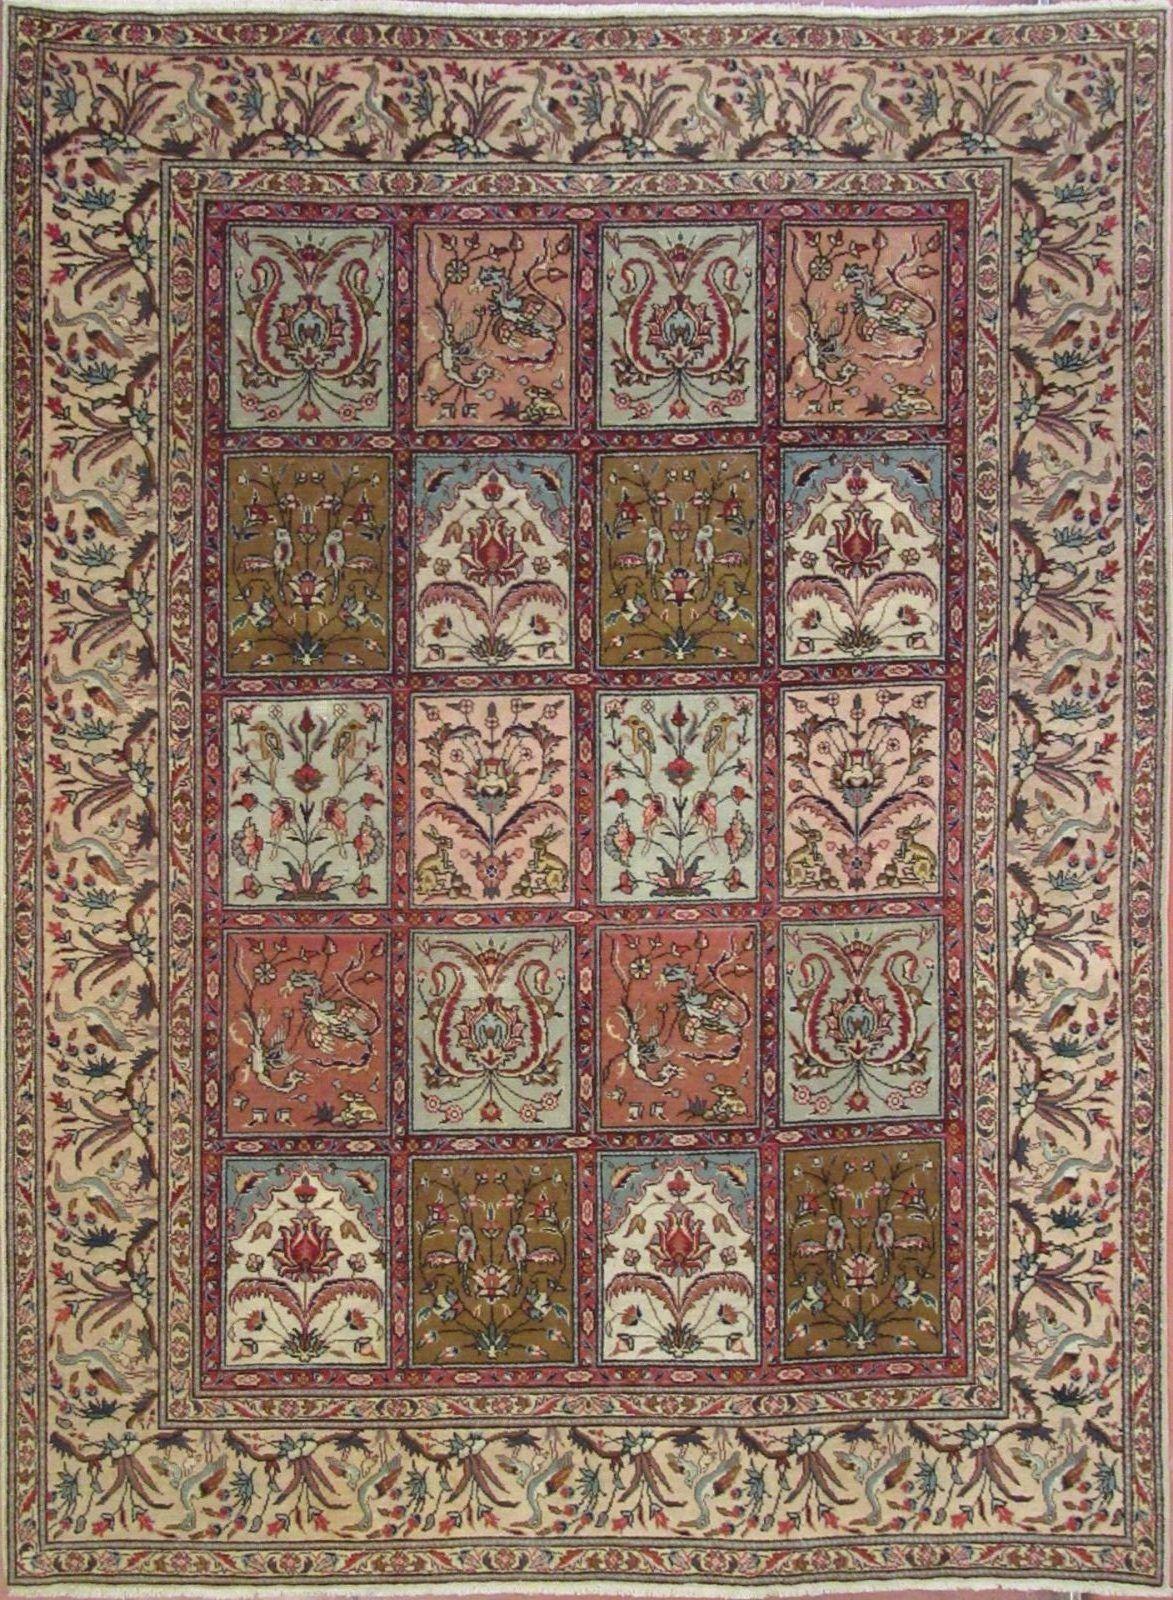 N.356732 – TABRIZ – 257 x 193 cm. – Tappeti Orientali e Moderni ...